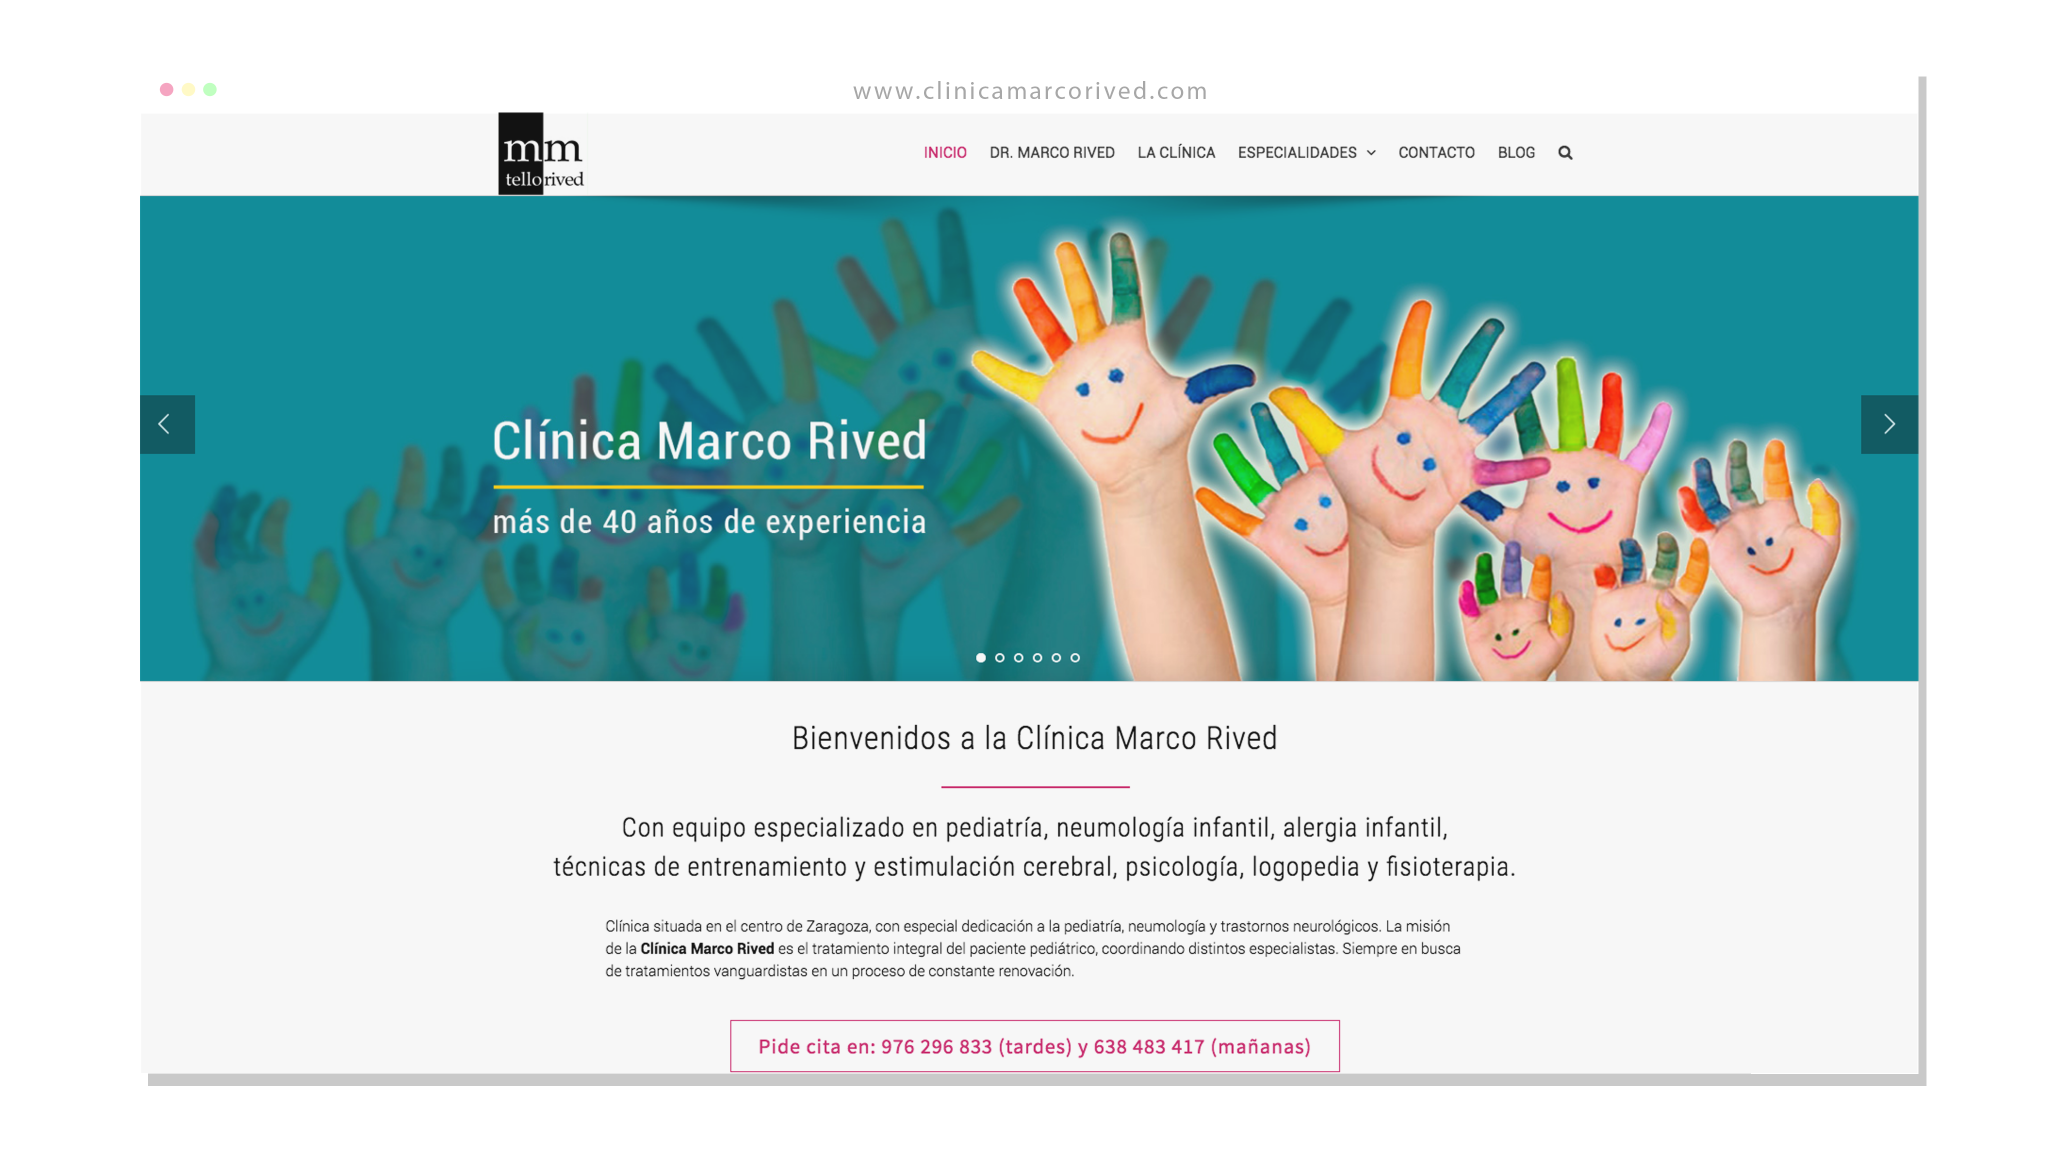 Clínica Marco Rived - Lus3